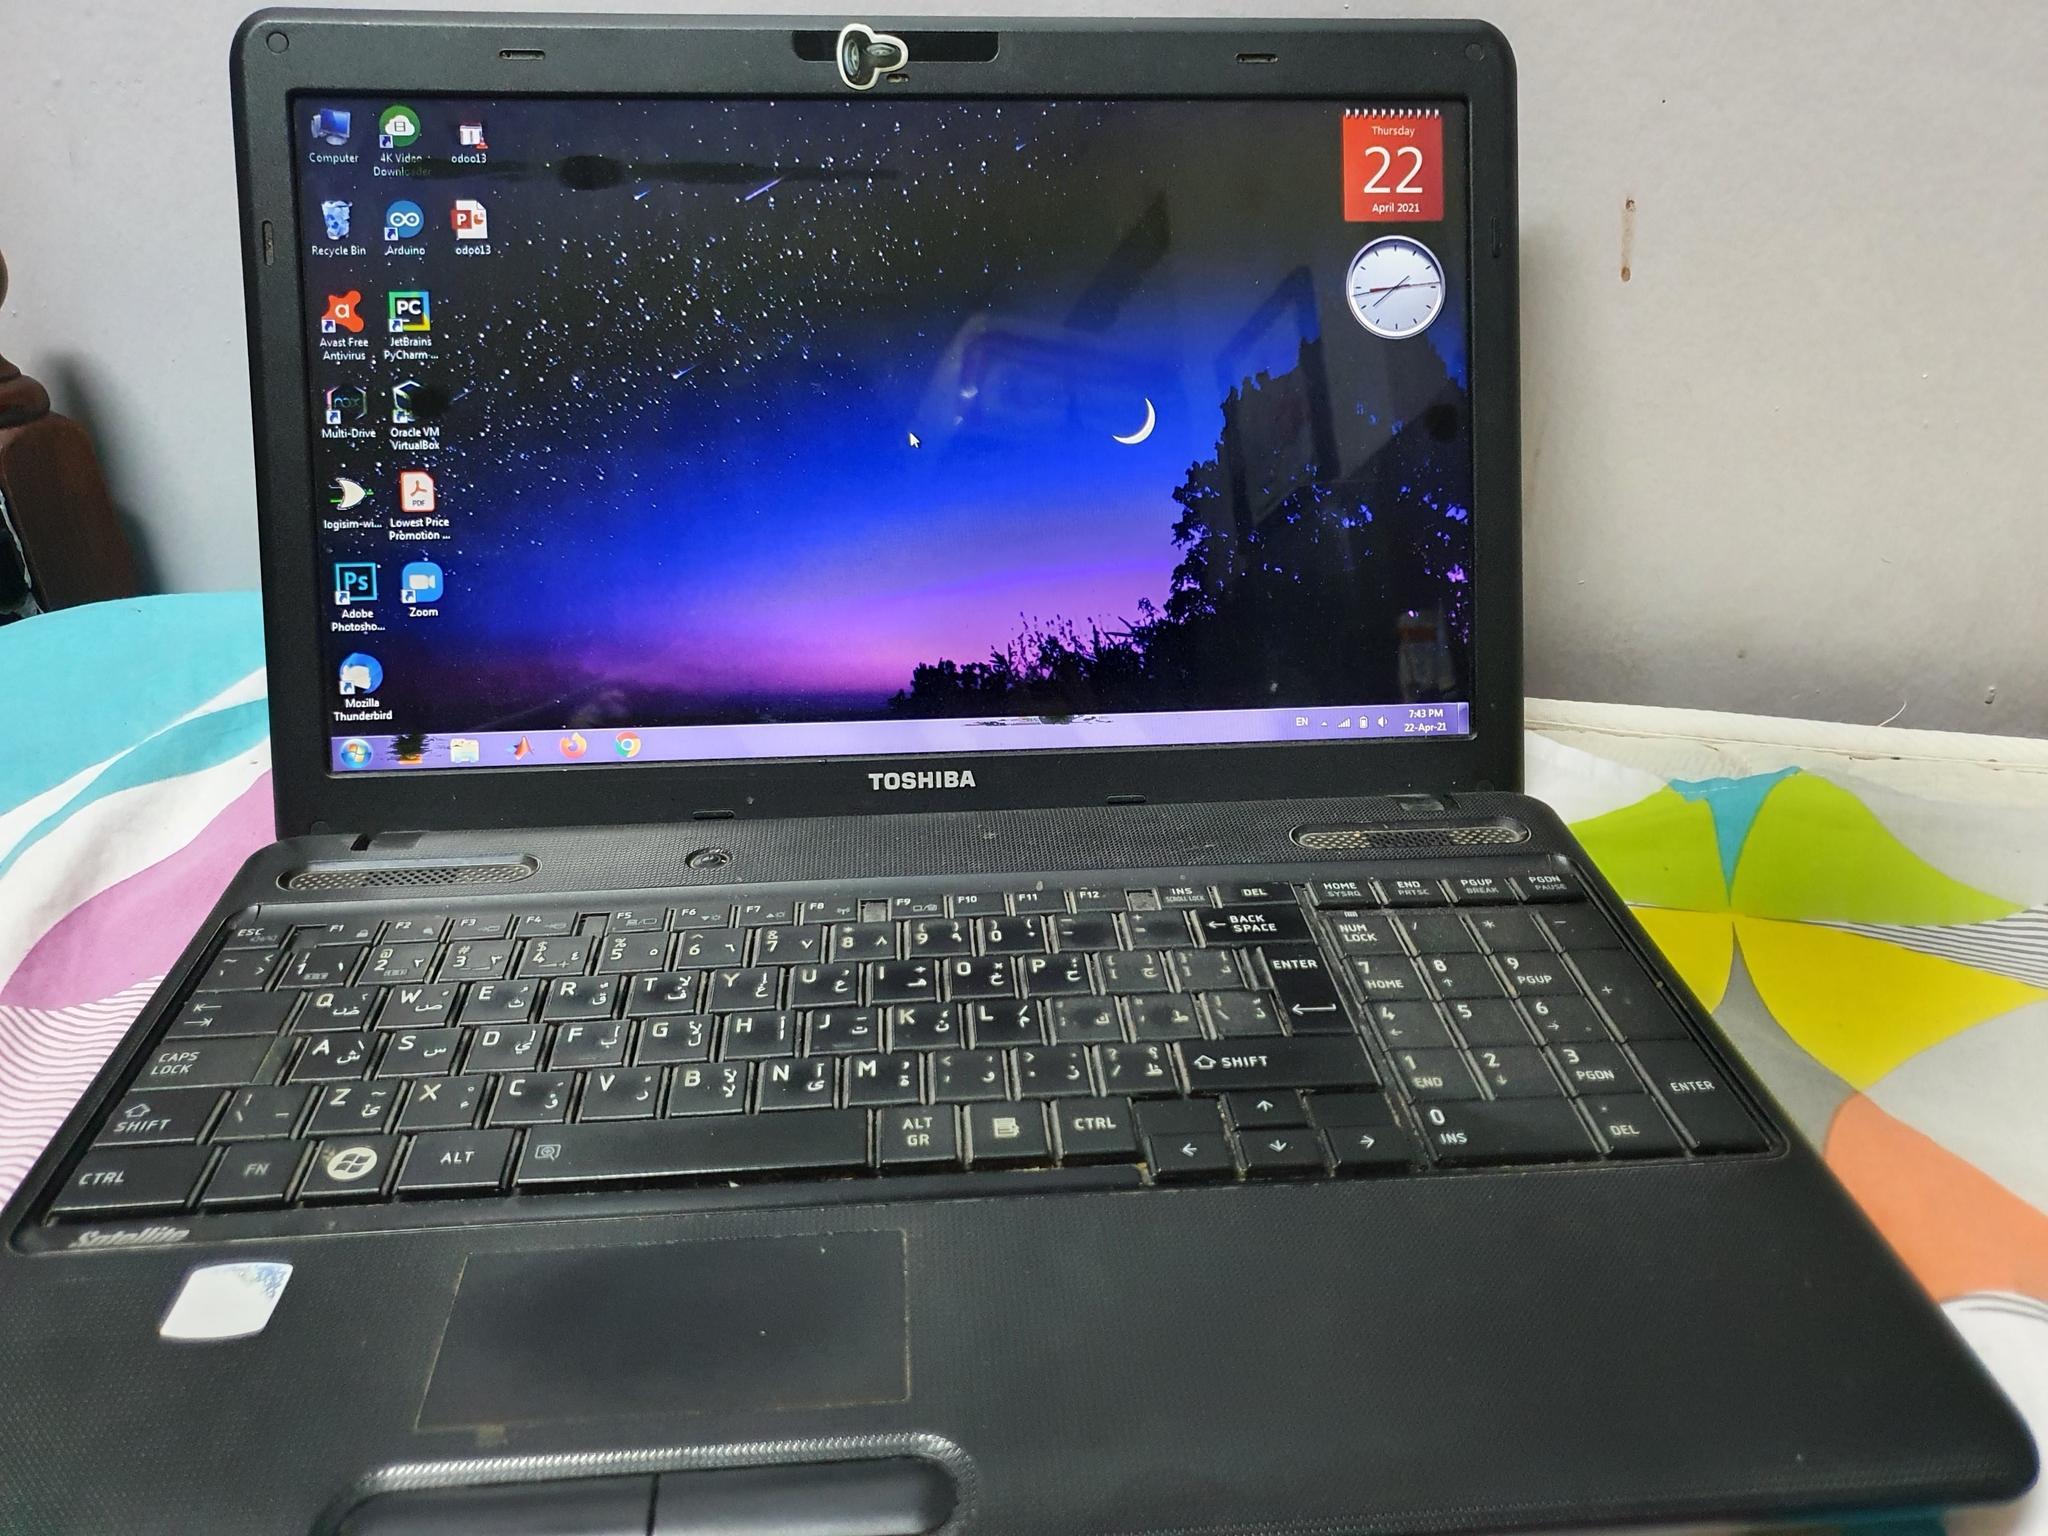 Toshiba Laptop Intel core i3